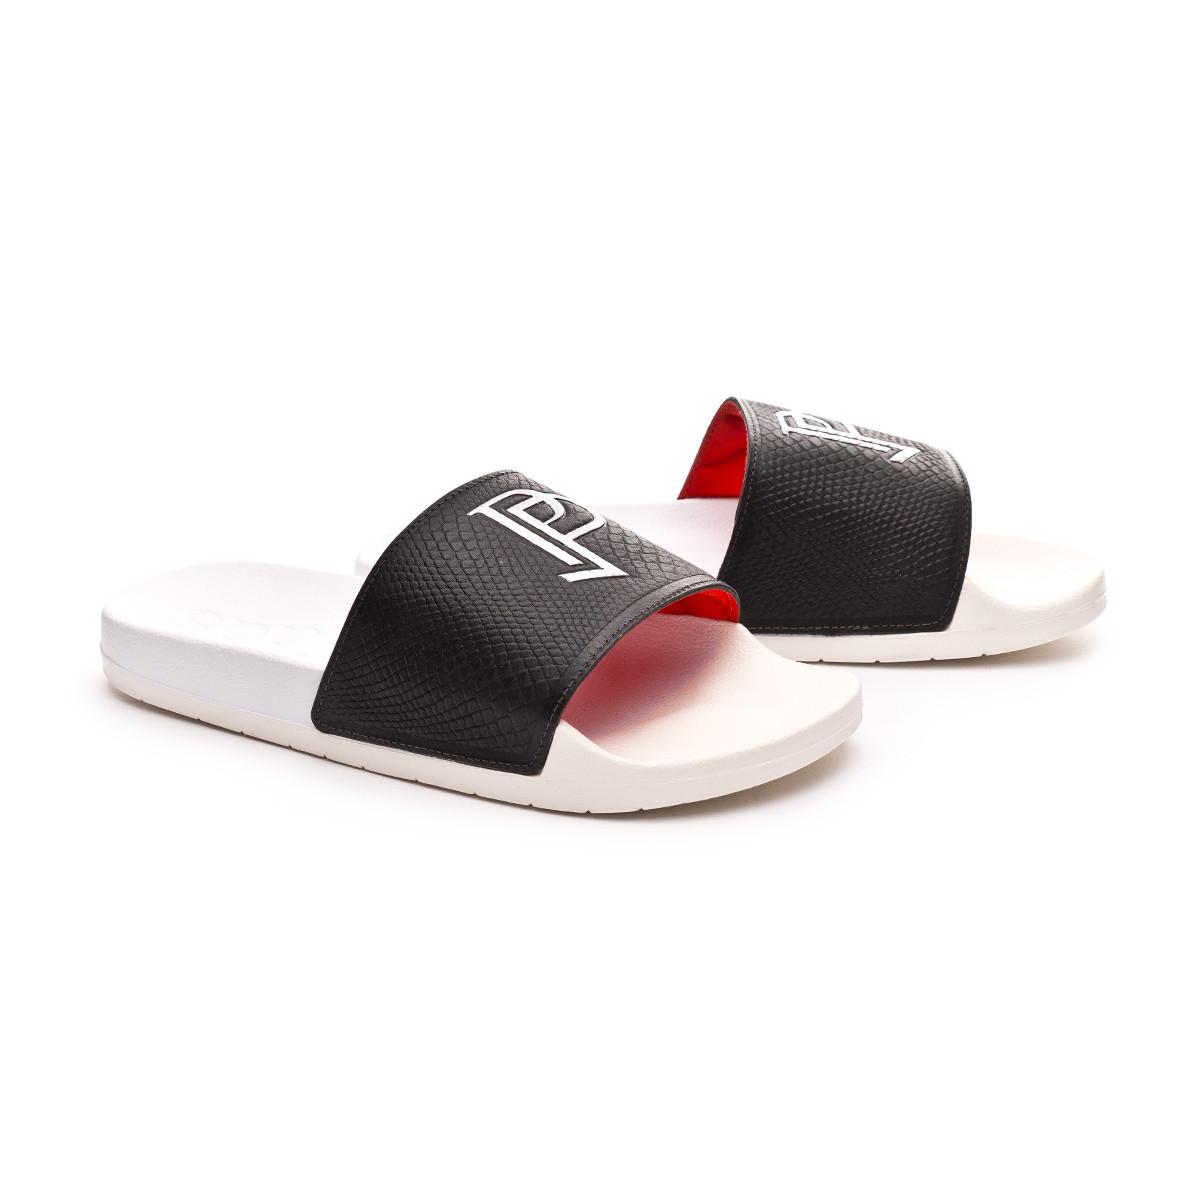 beb53a2a Chinelos adidas Adilette Paul Pogba Off White-Red-Core Black - Loja de  futebol Fútbol Emotion